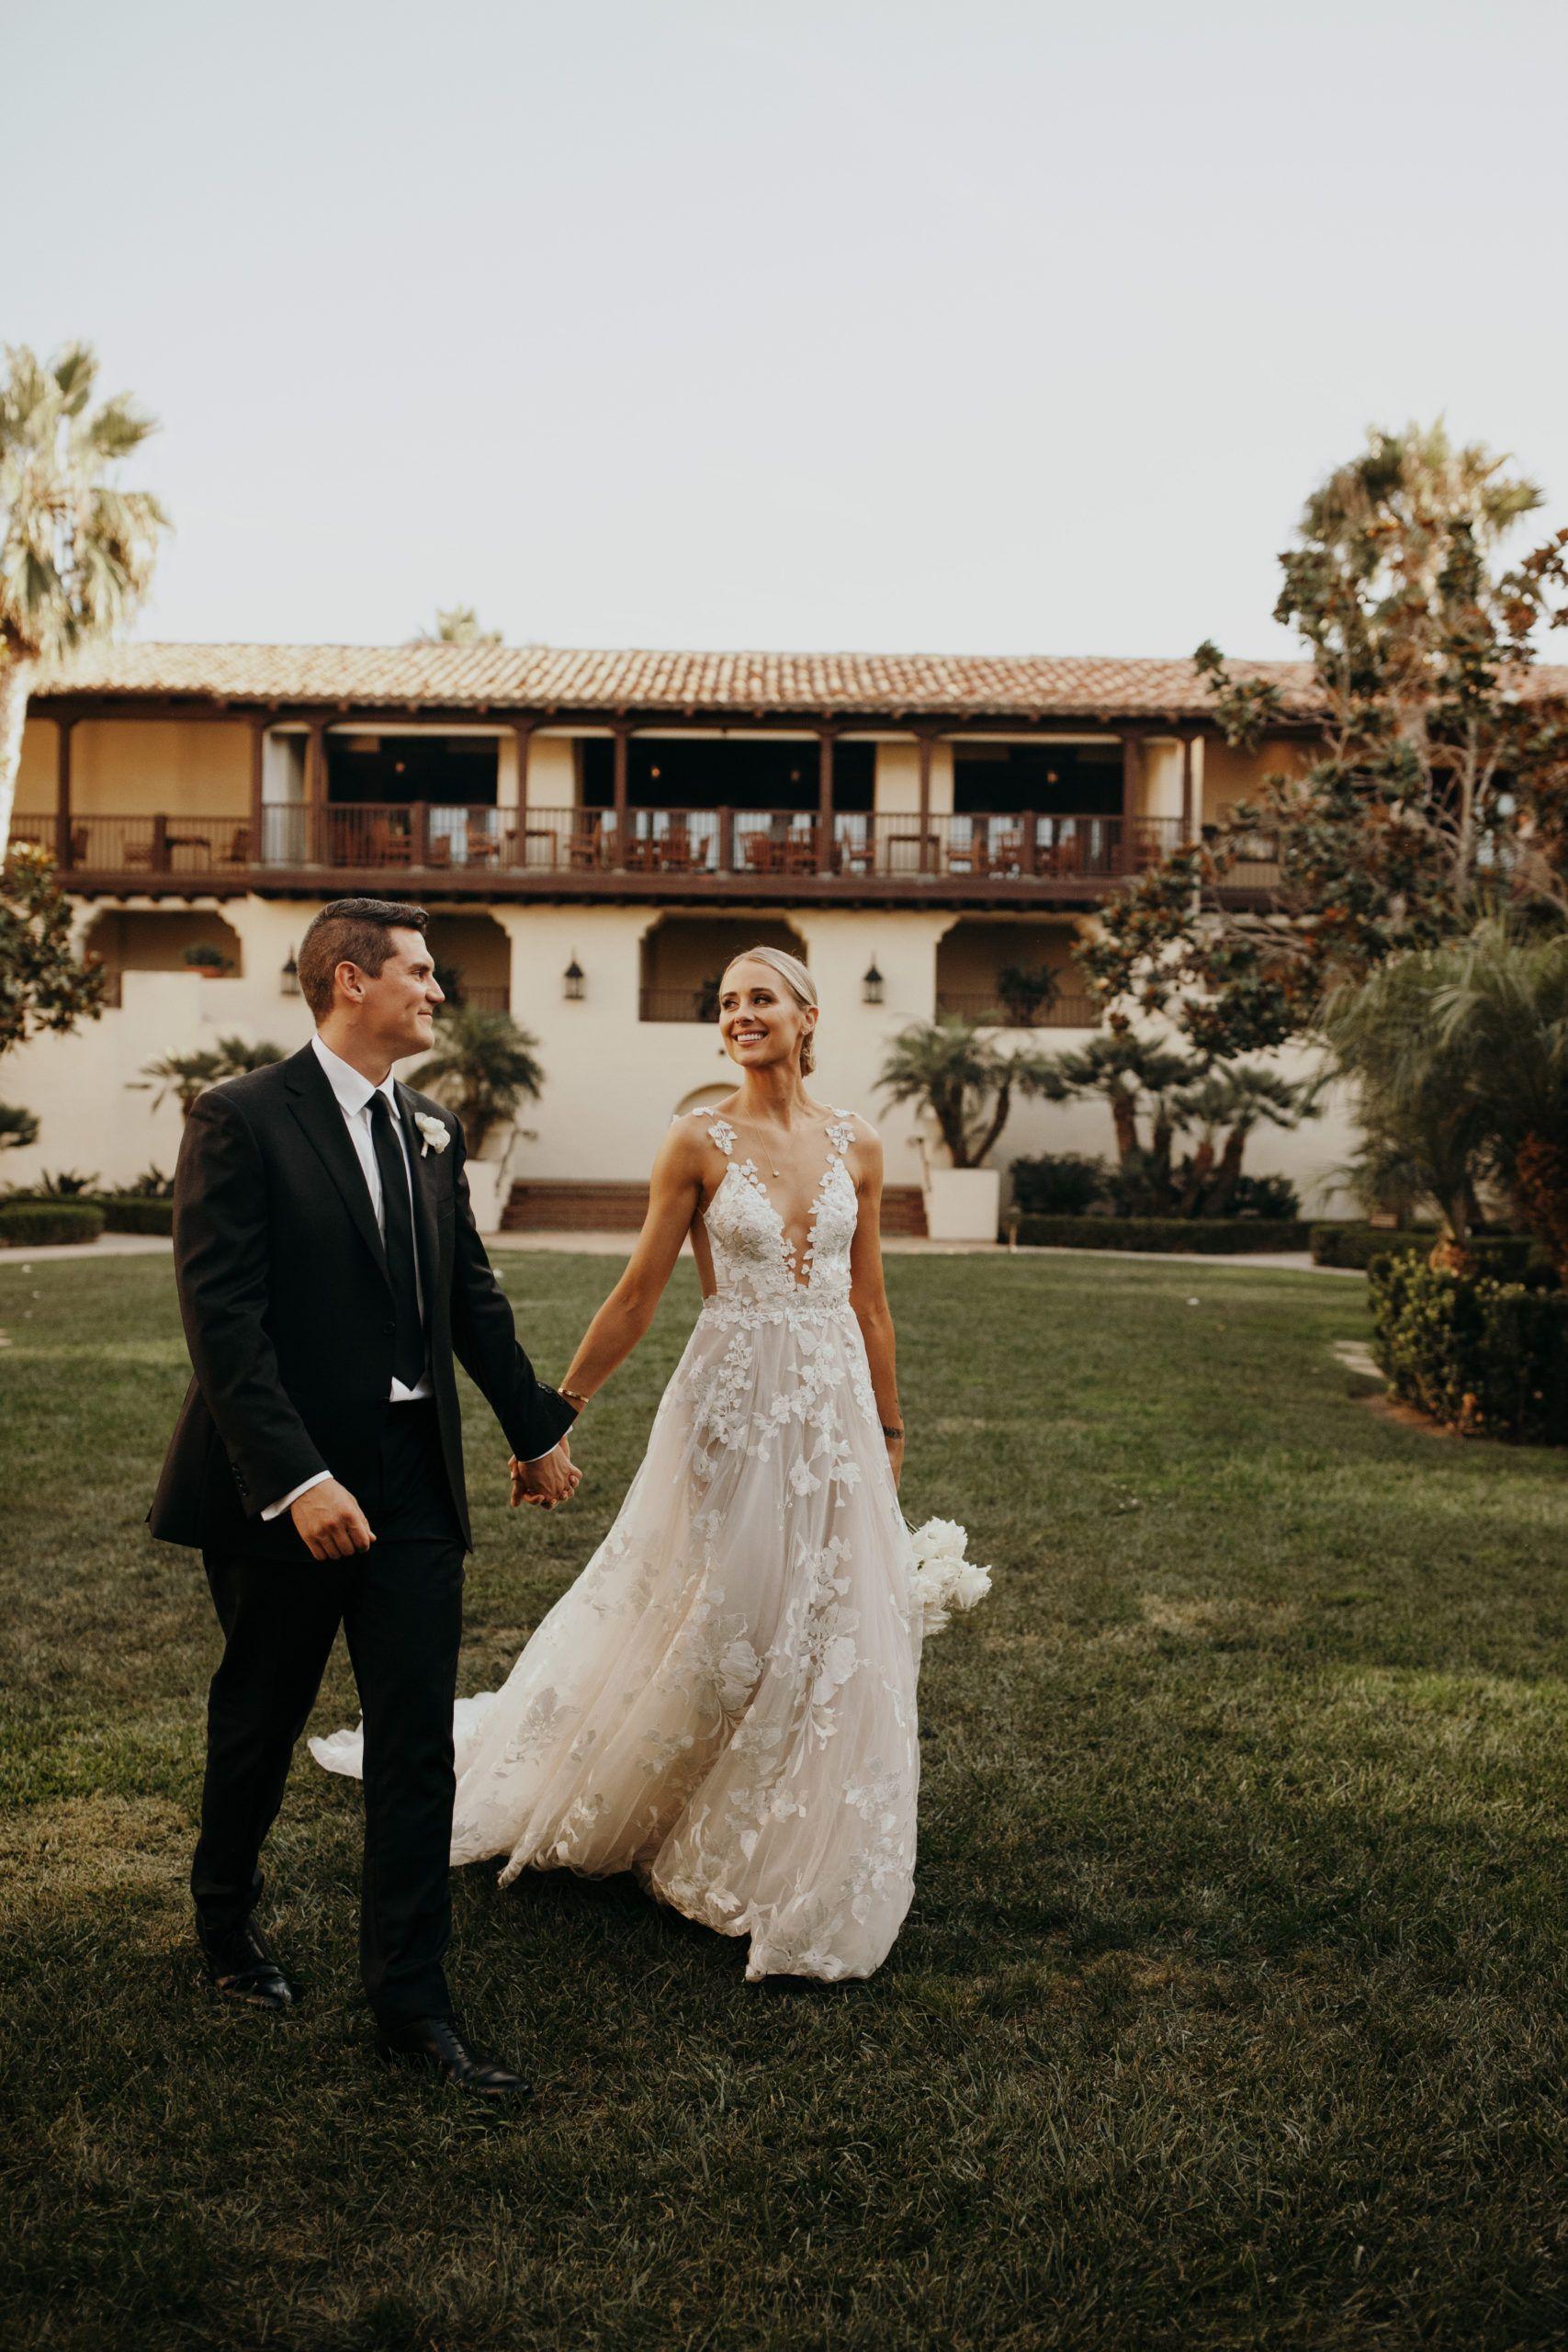 Outdoor Wedding California Wedding Southern California Wedding Wedding Dress Summer Wedding Rehearsal Outfit Galia Lahav Wedding Dress Wedding Dresses Lace [ 2560 x 1707 Pixel ]